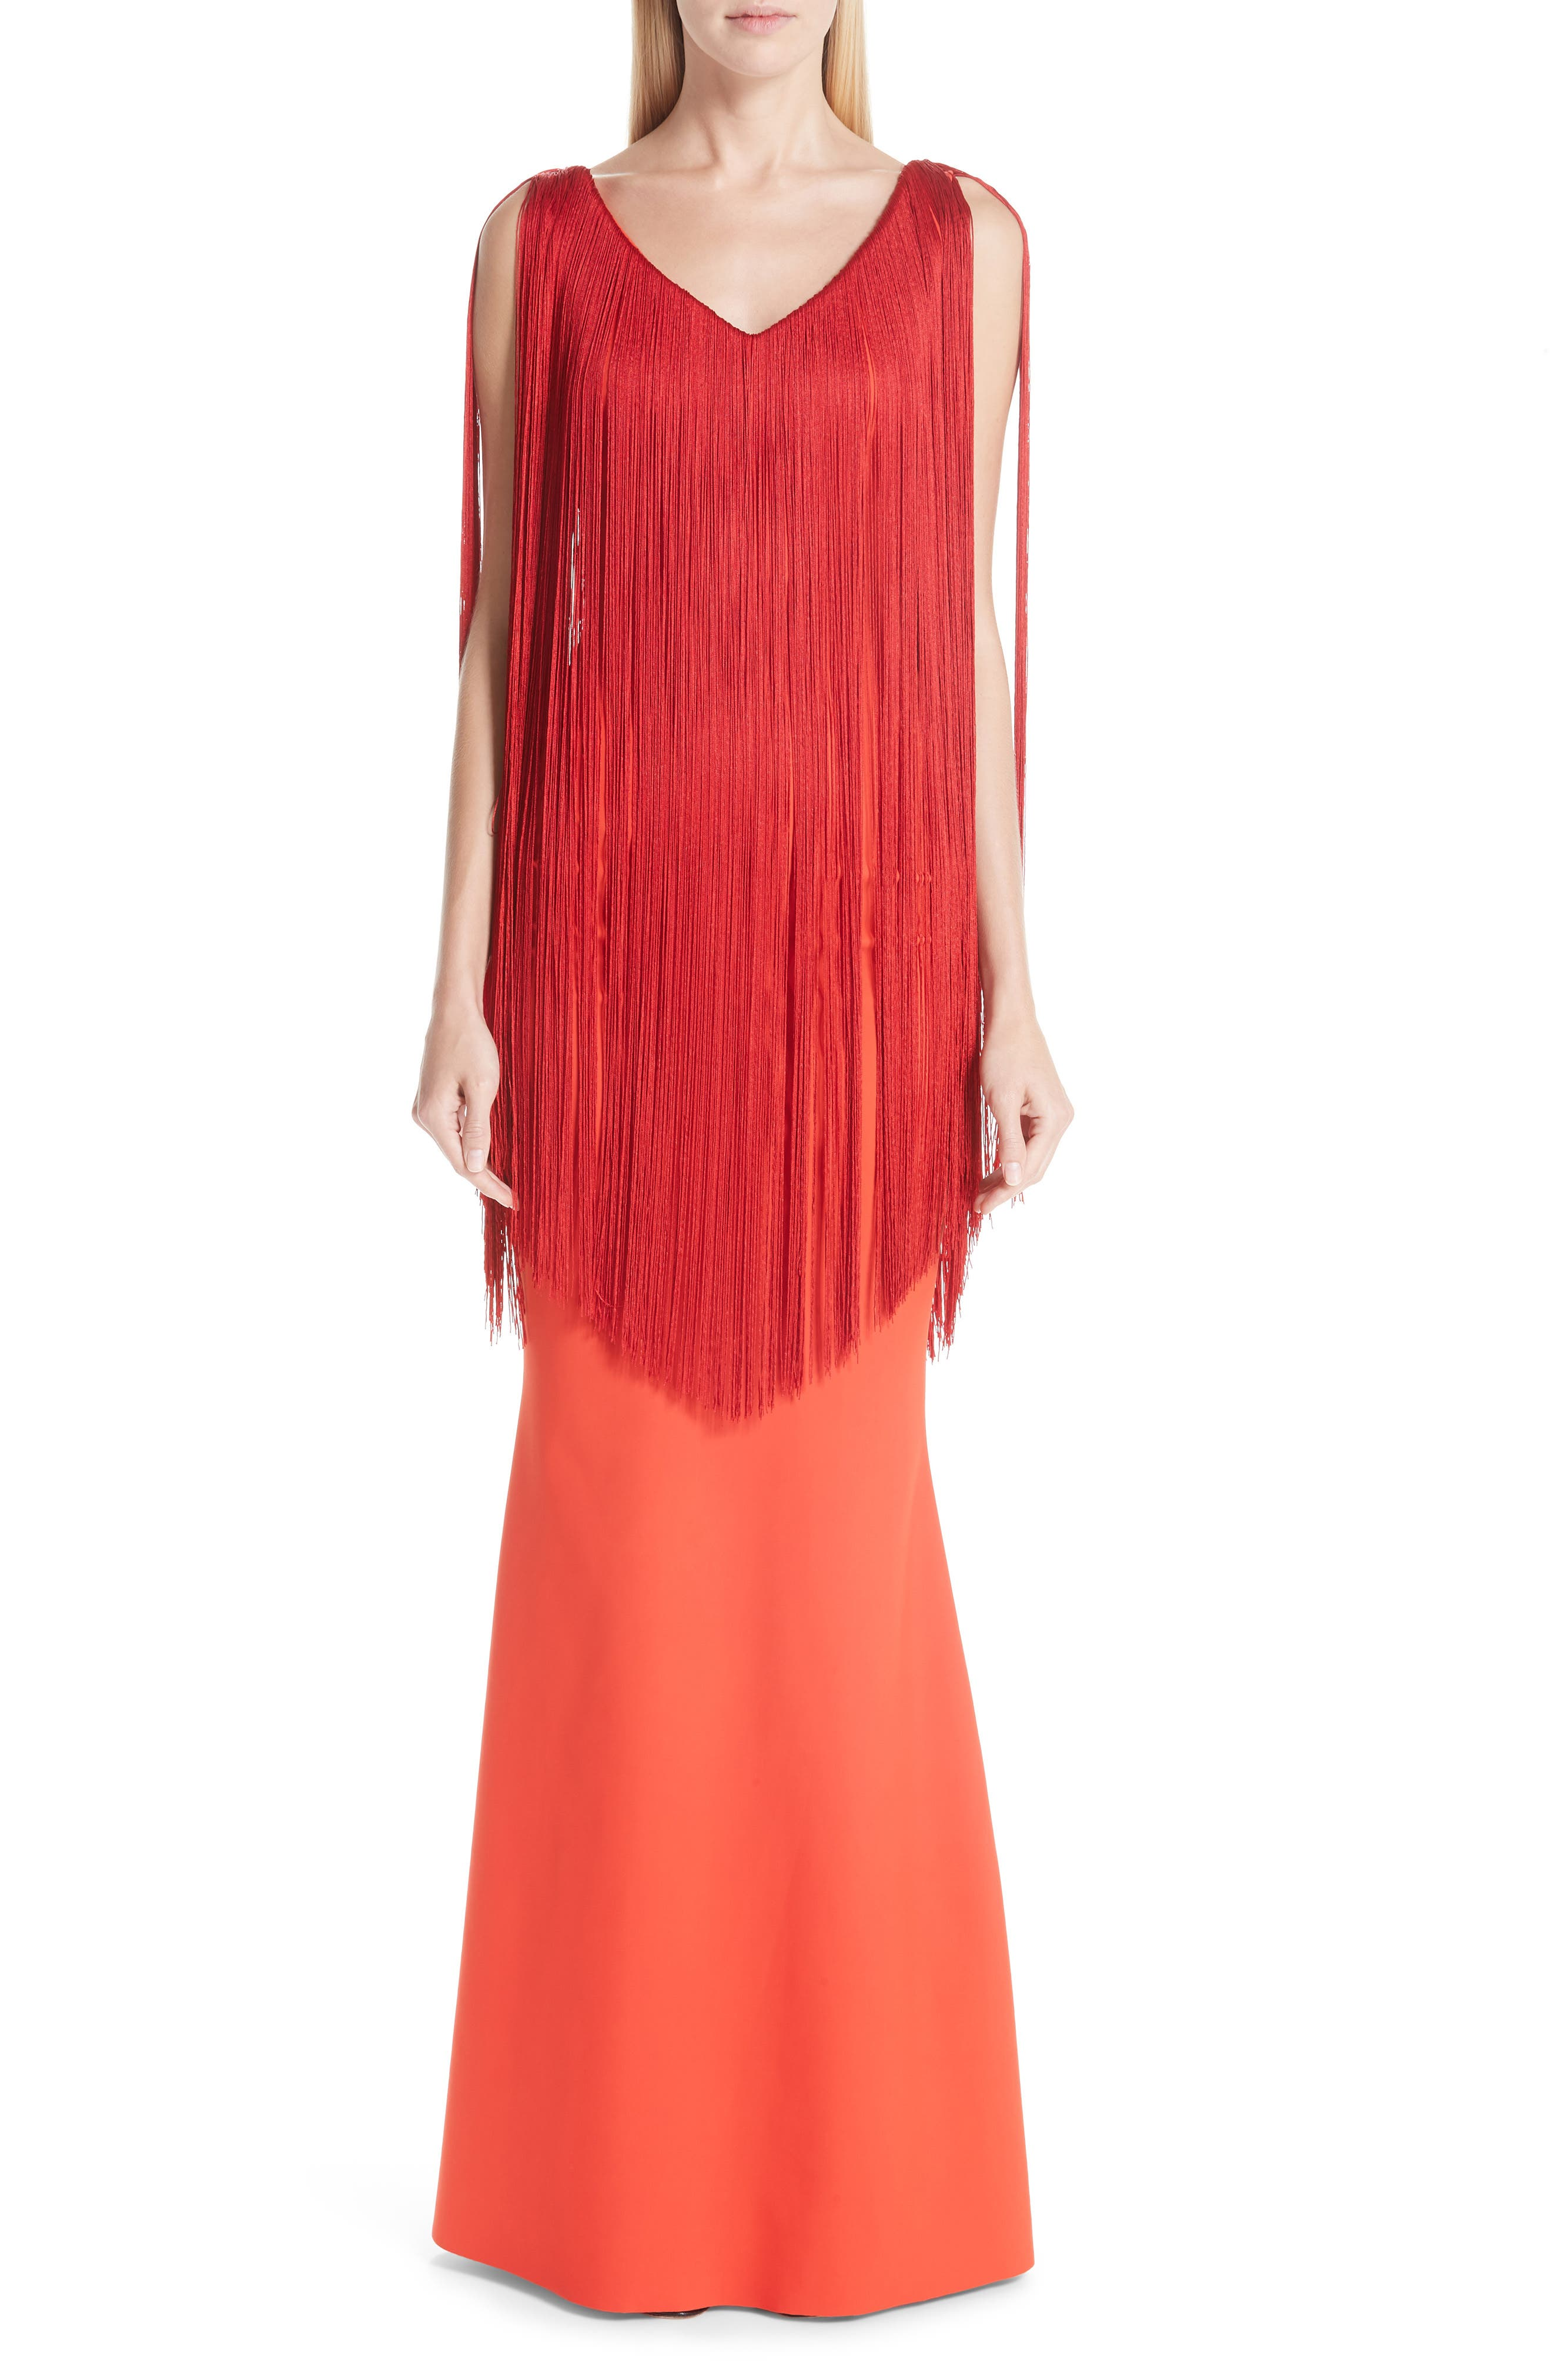 Tammy Fringe Evening Dress by Chiara Boni La Petite Robe